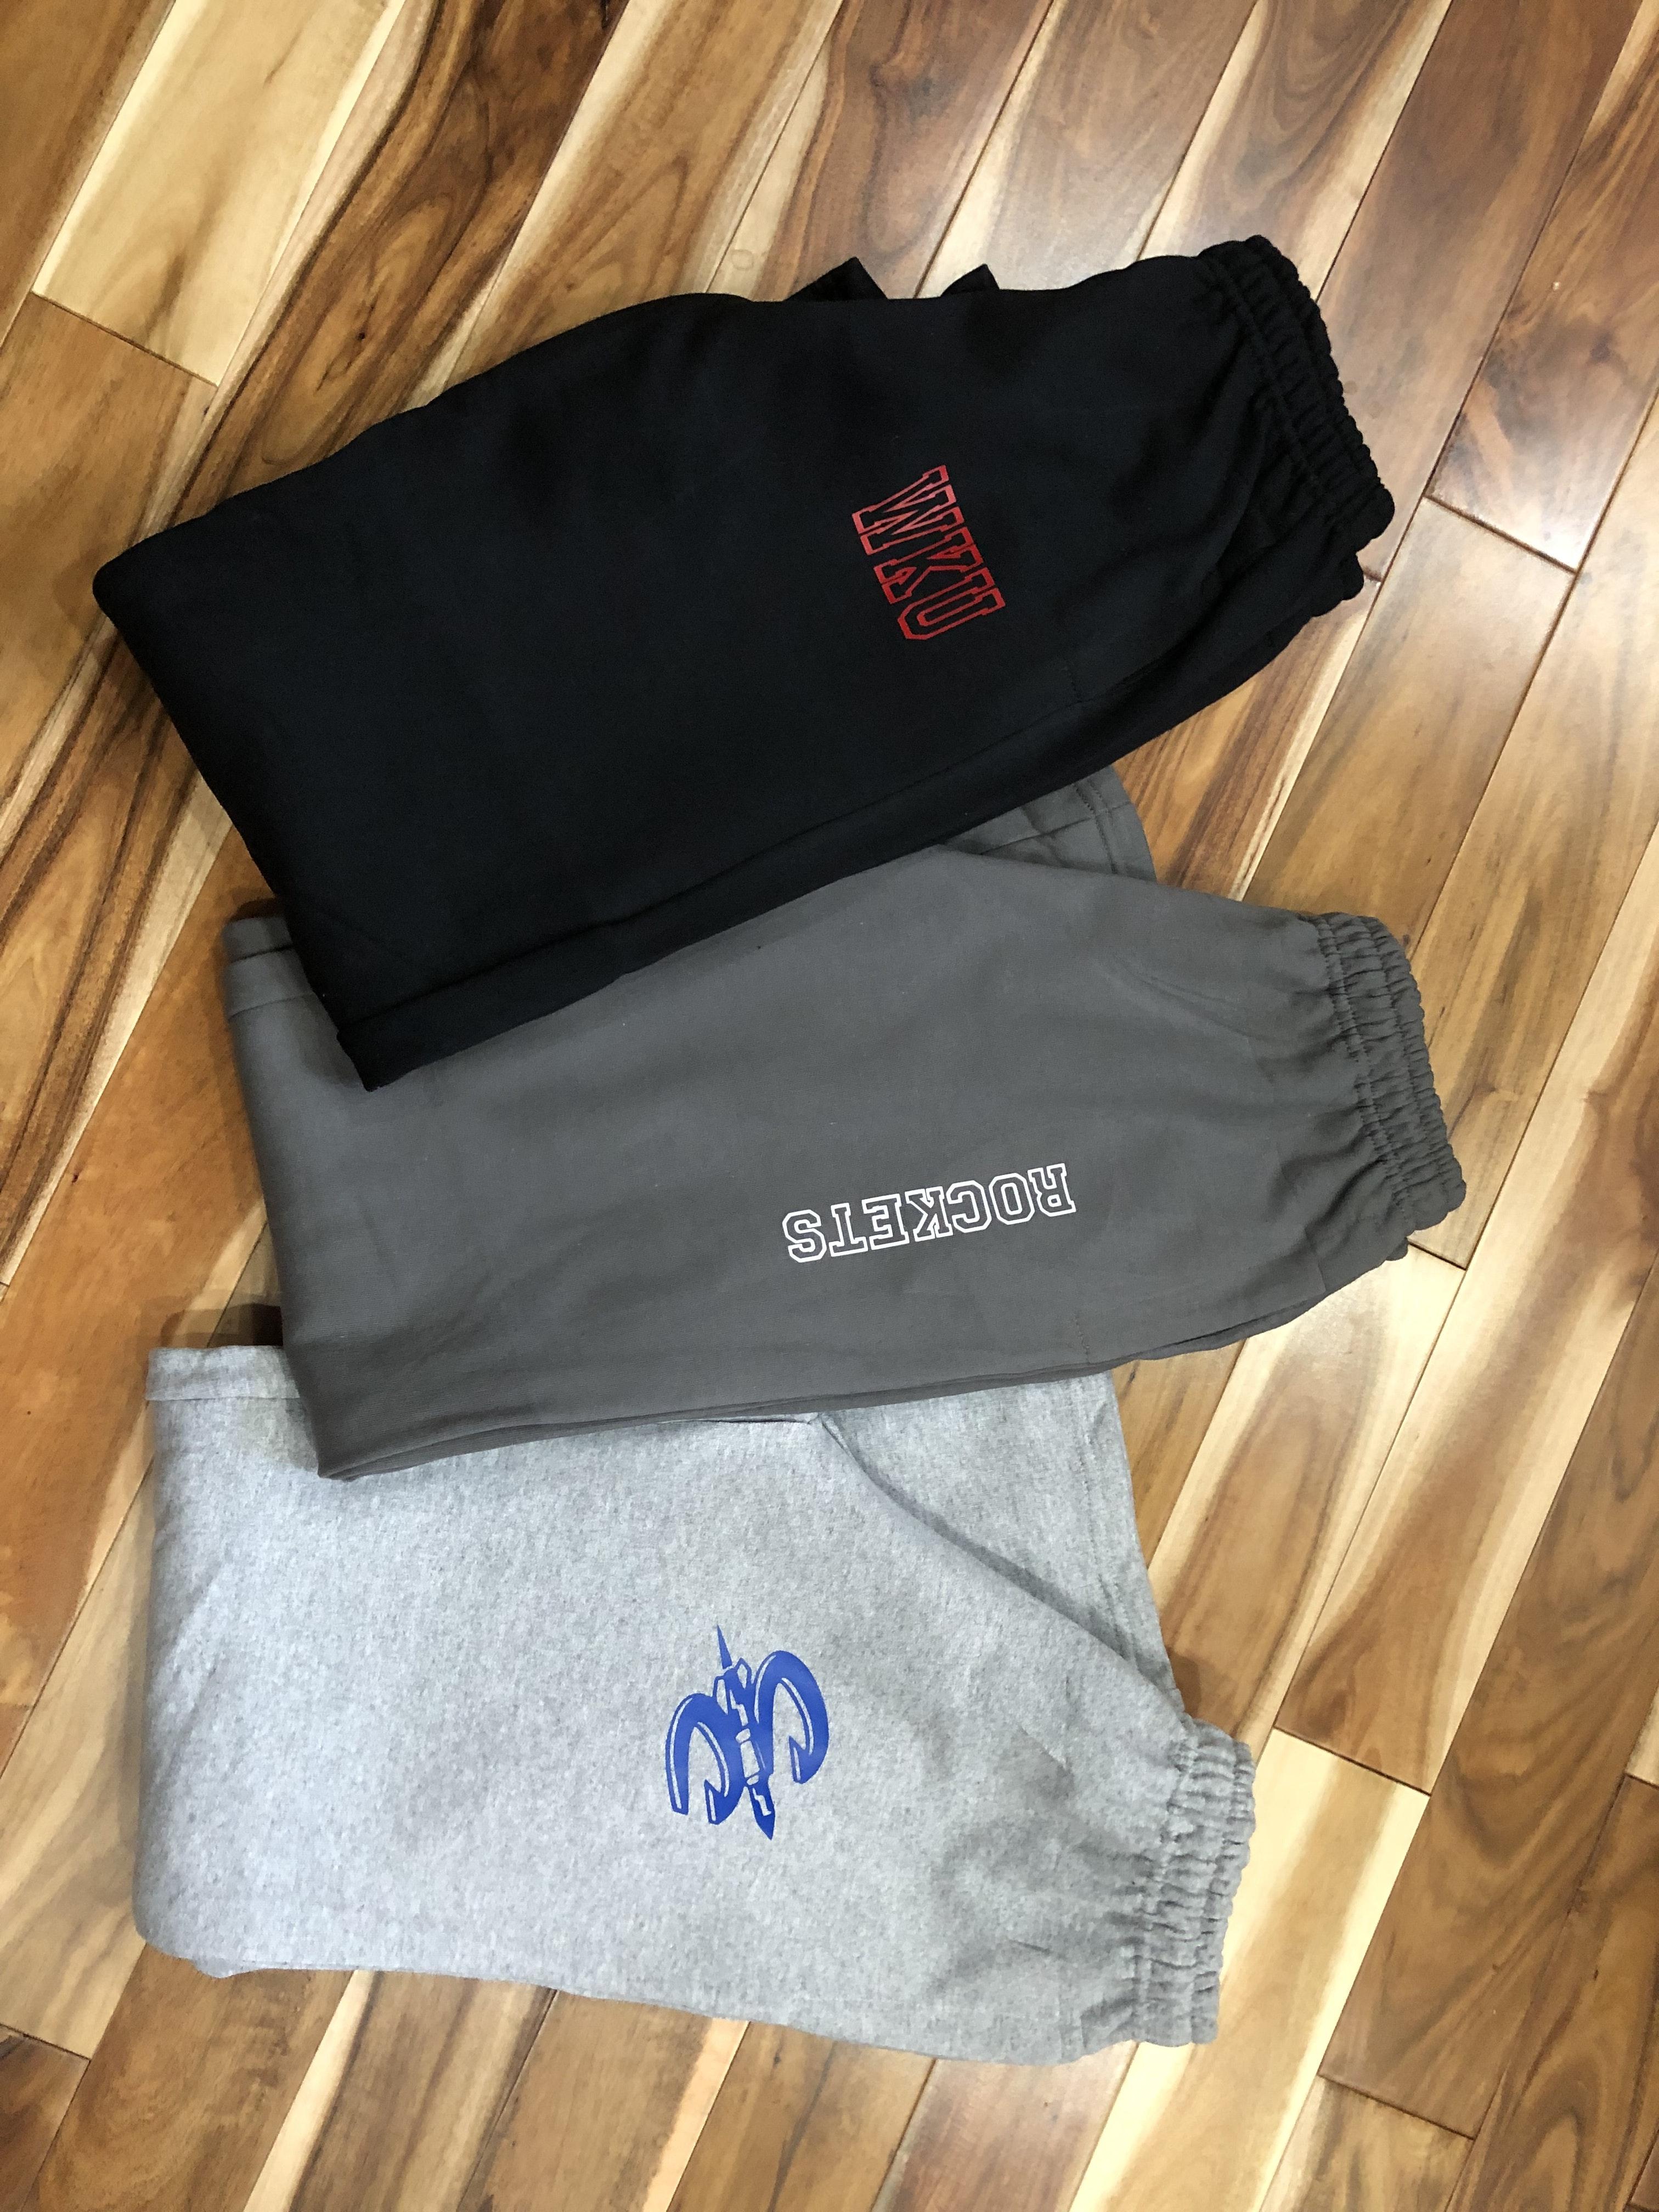 Gildan G123 customer review by Keri Shouse Perfect sweats!